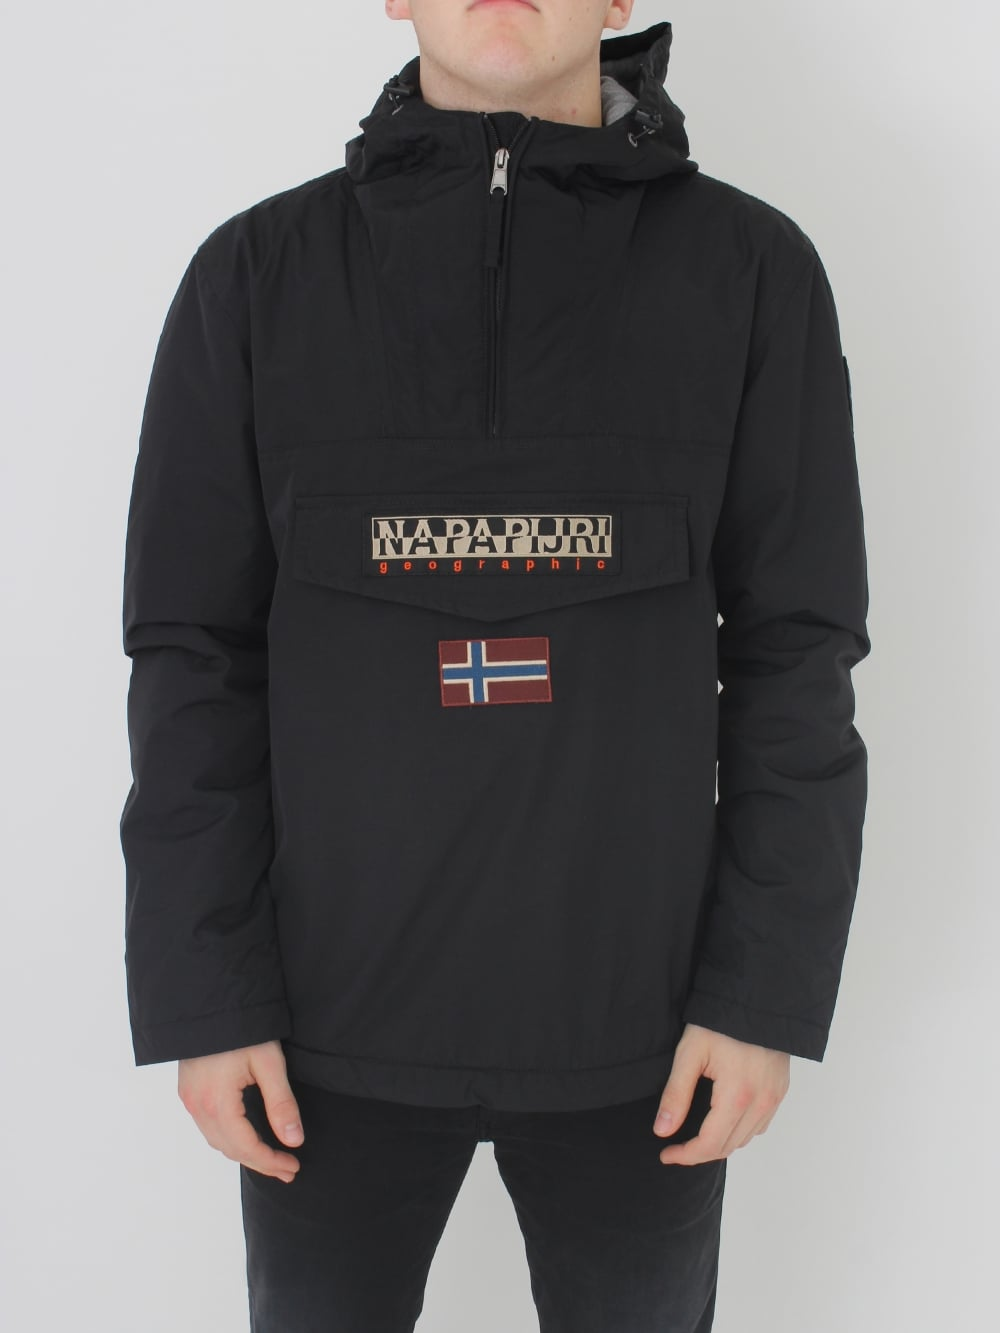 907a9a2d466c4 Napapijri Rainforest Winter jacket in Black - Northern Threads